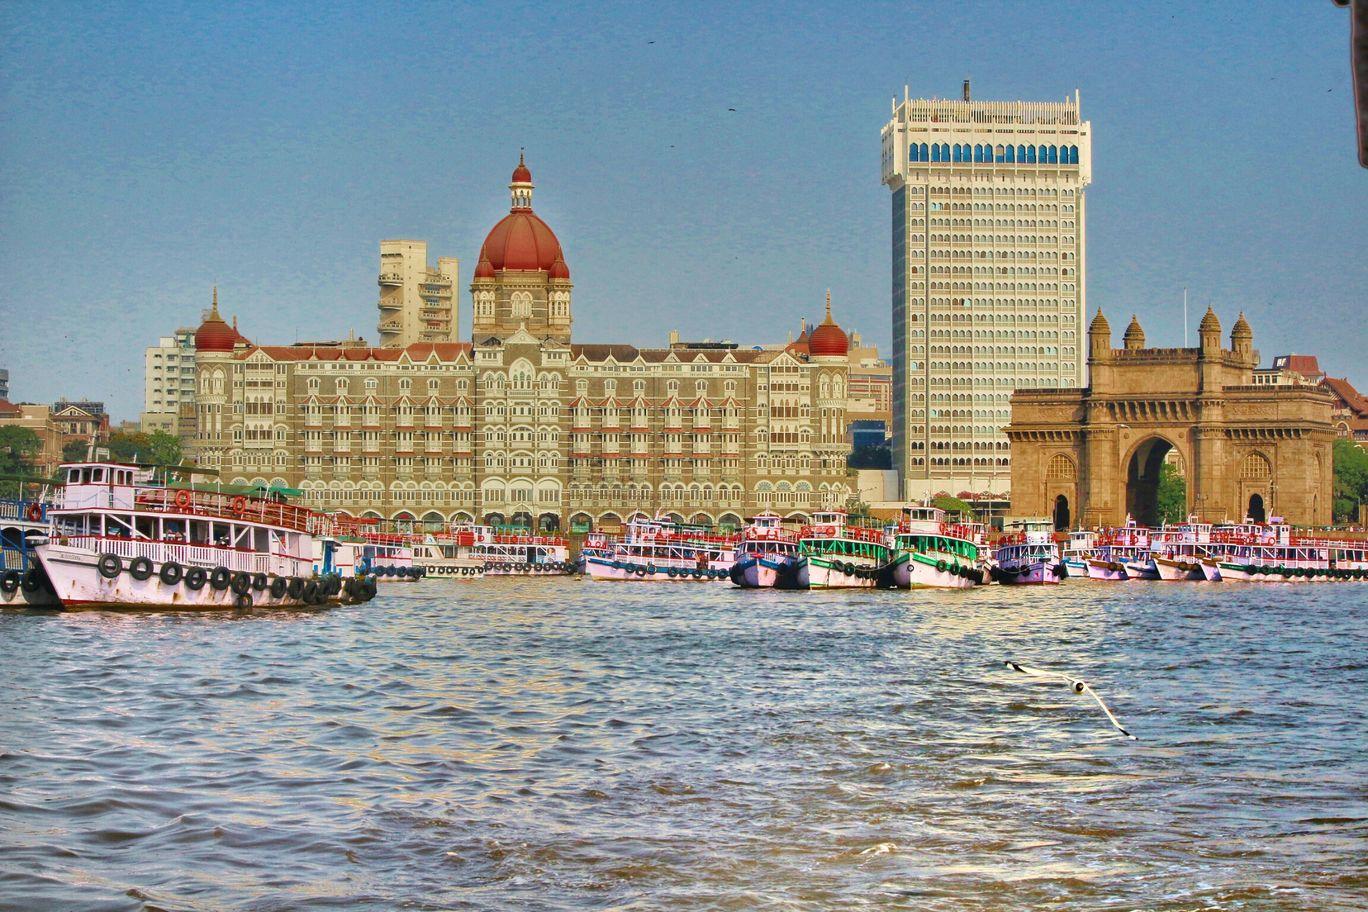 Photo of Gateway of India By Dipesh Thakkar (bombay_grapher)